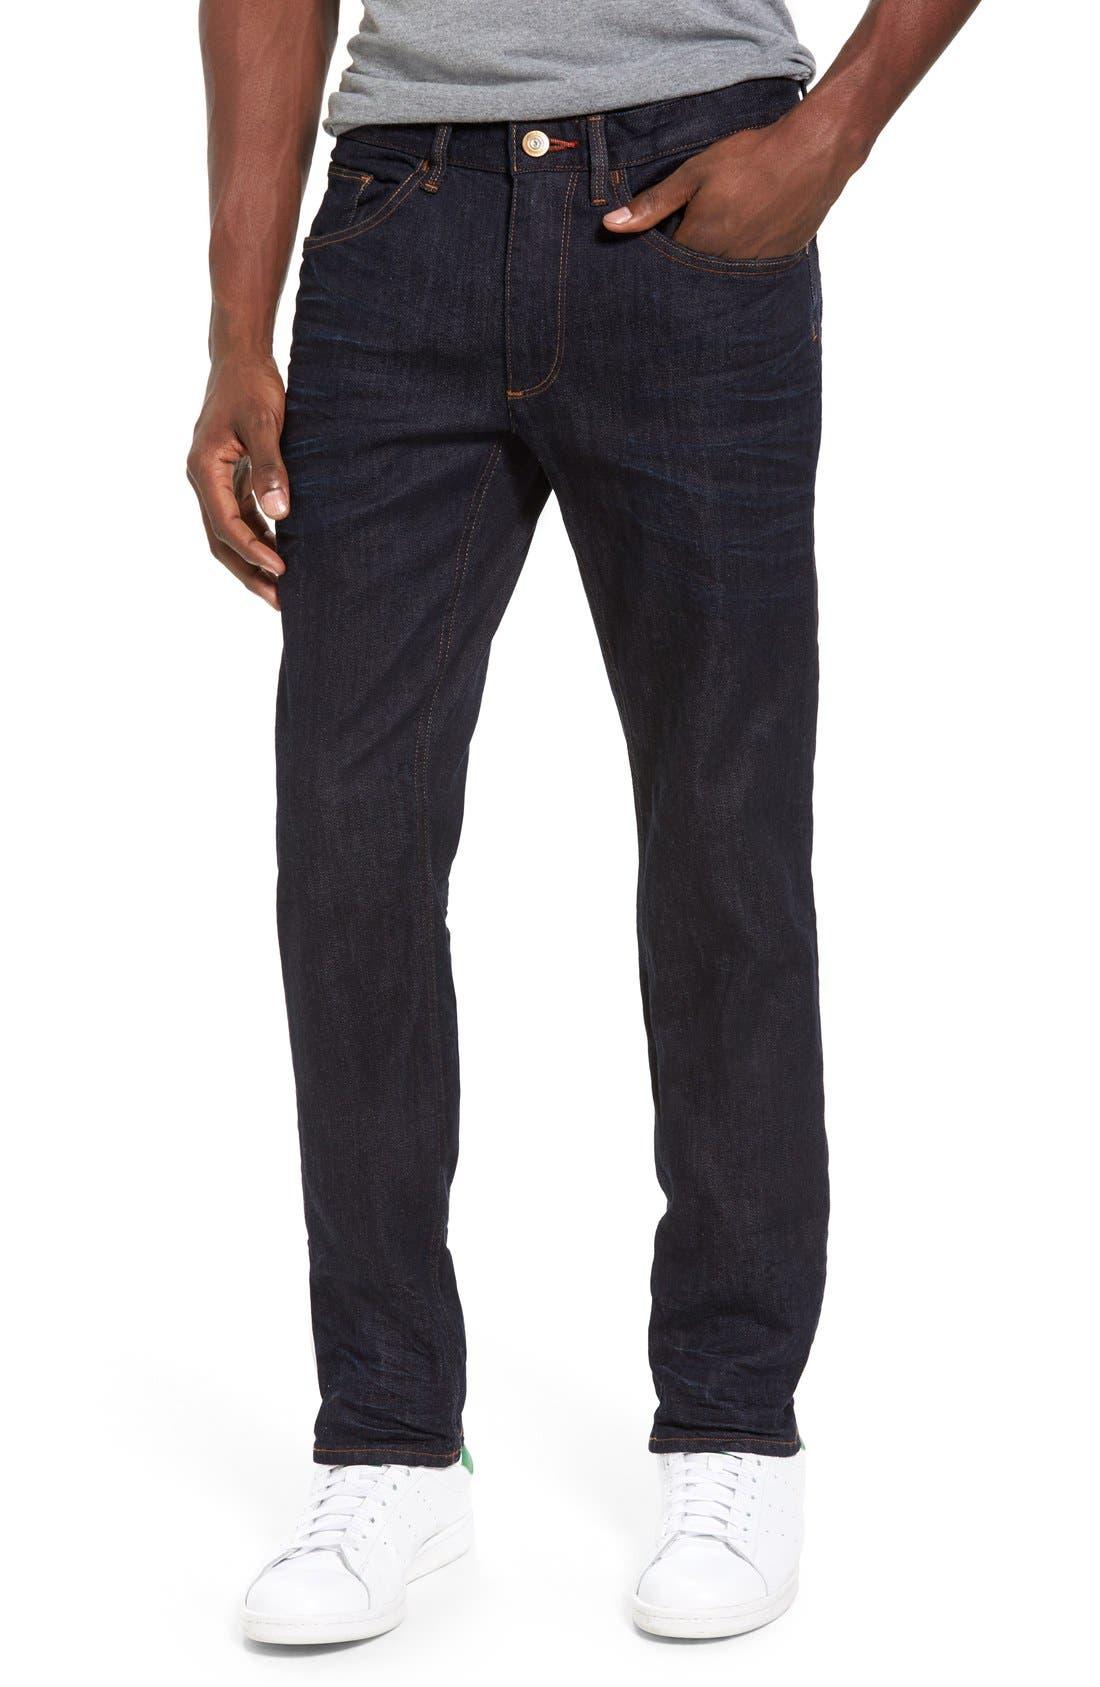 Canal Slim Fit Jeans,                         Main,                         color,